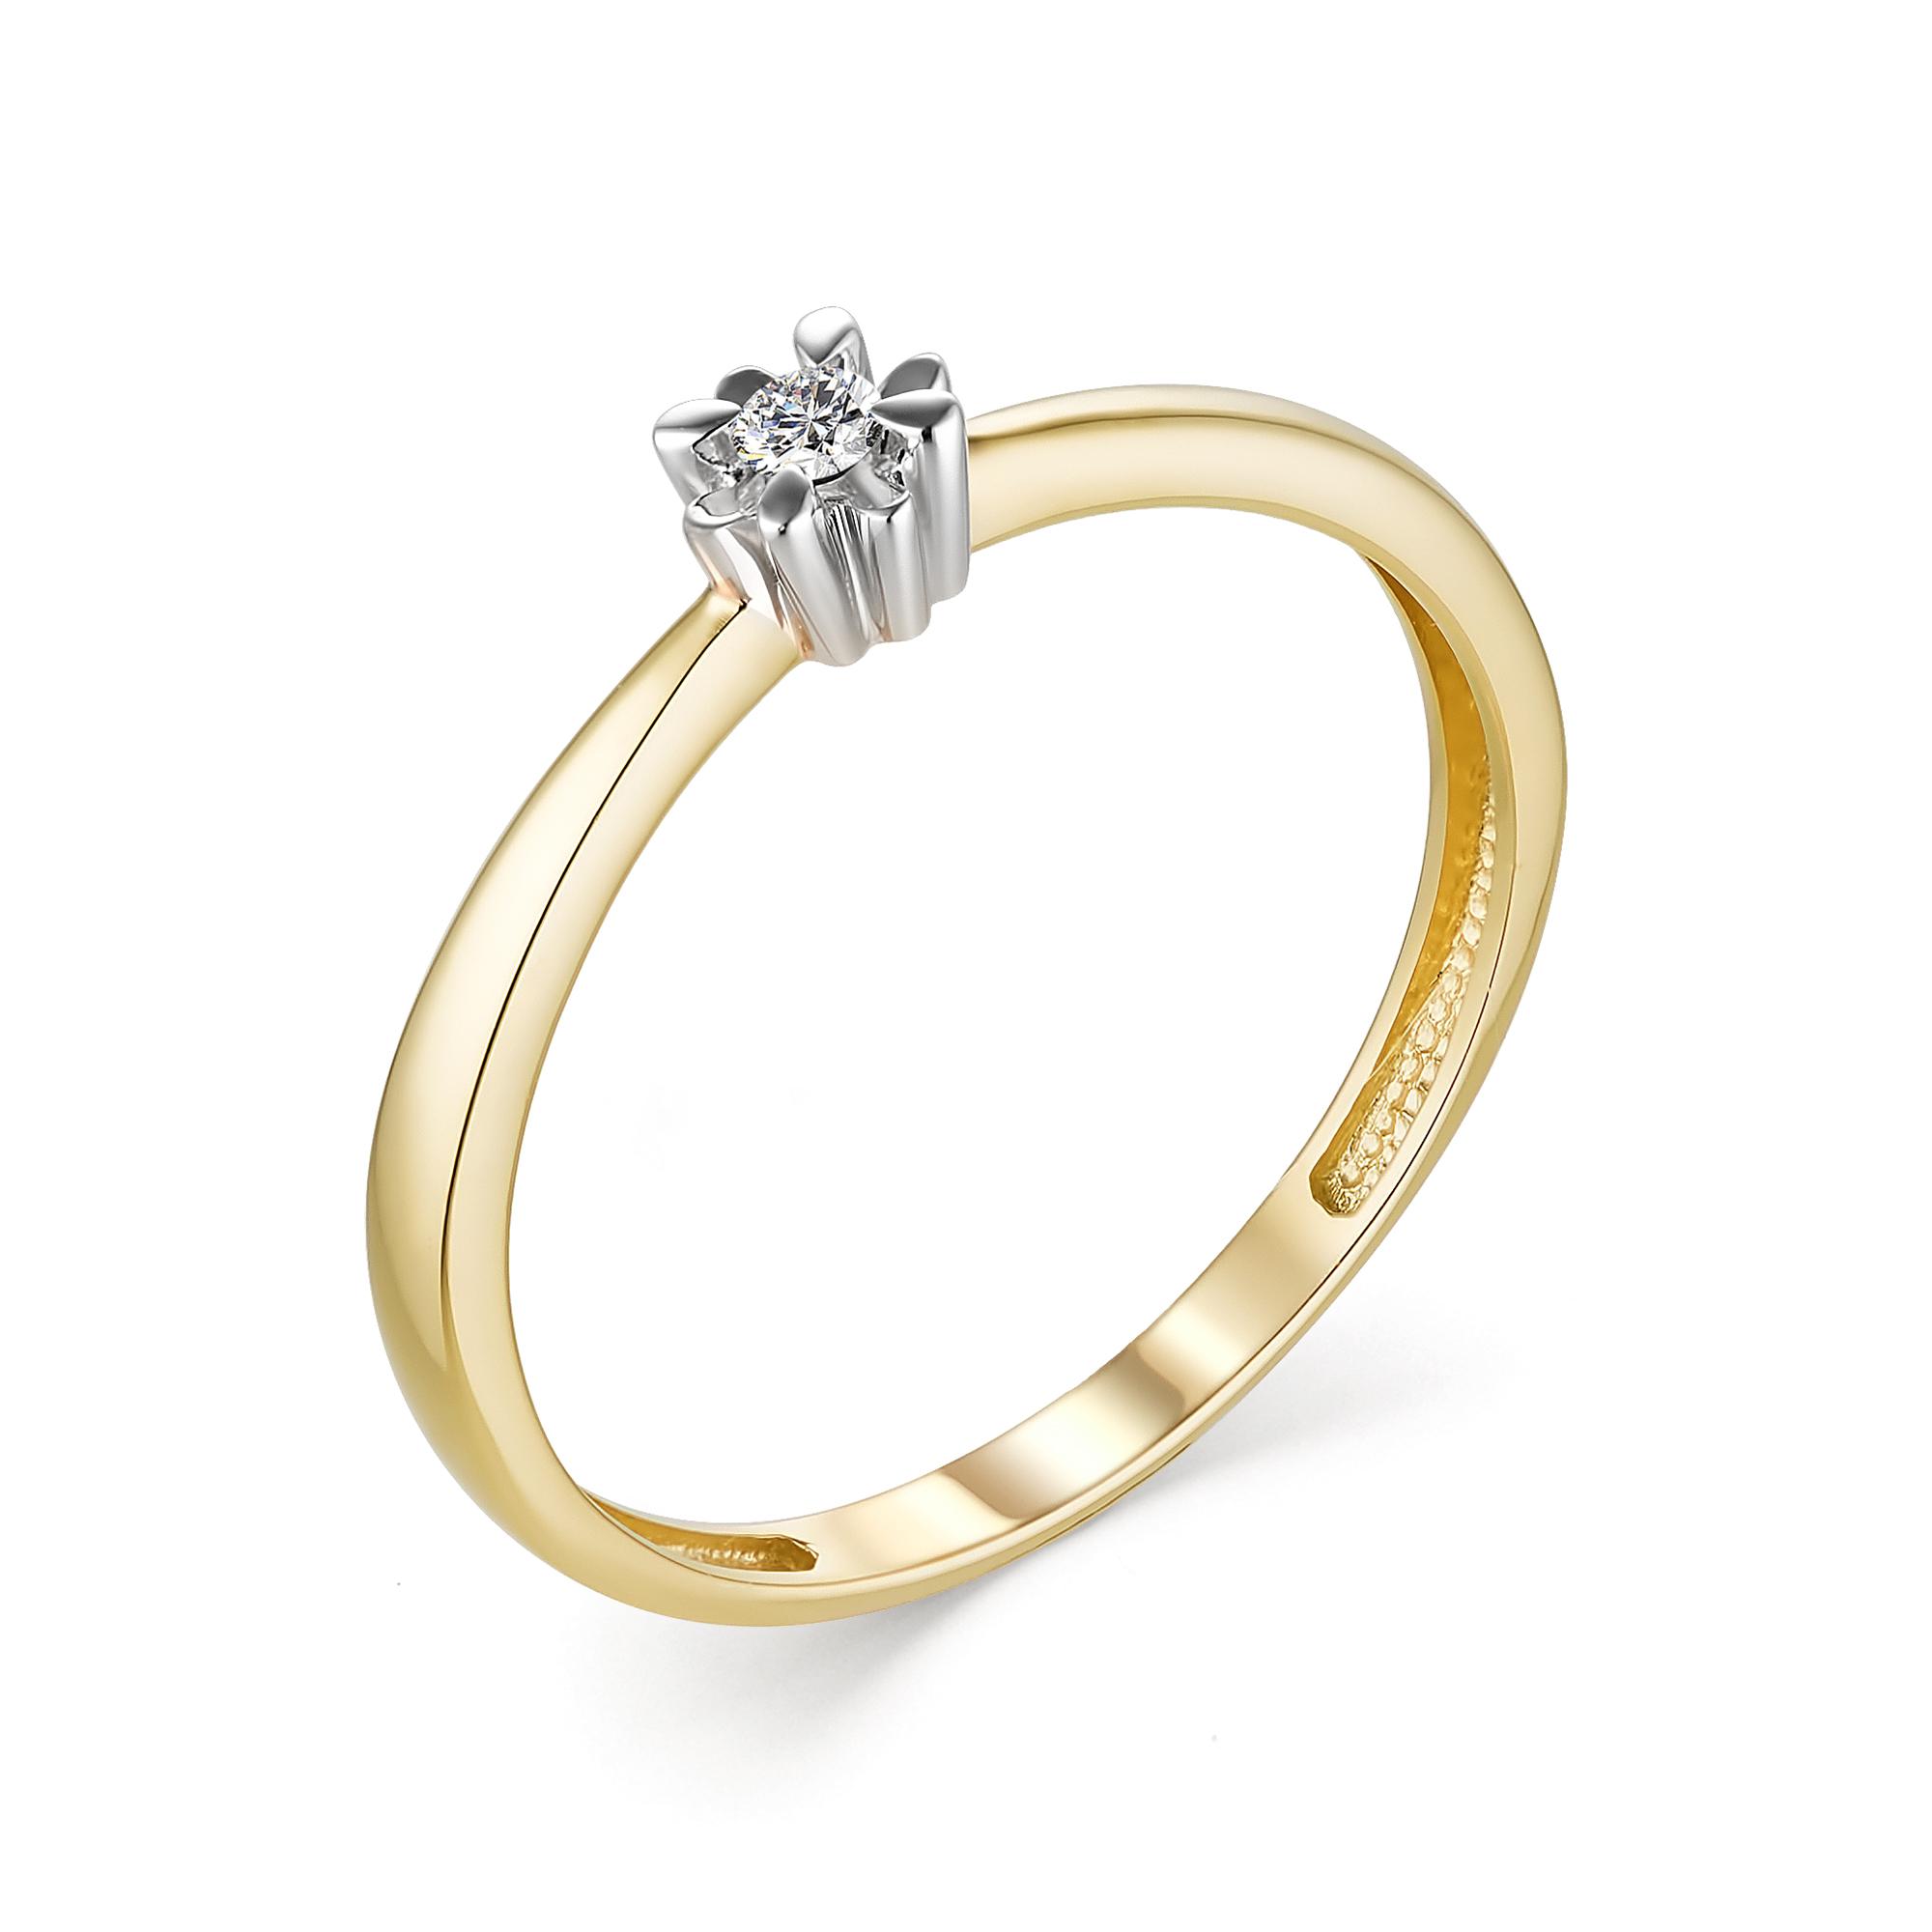 картинка кольцо 13273-300 1 бриллиант круг 57 0,038 25-30 3/6а 13273-300